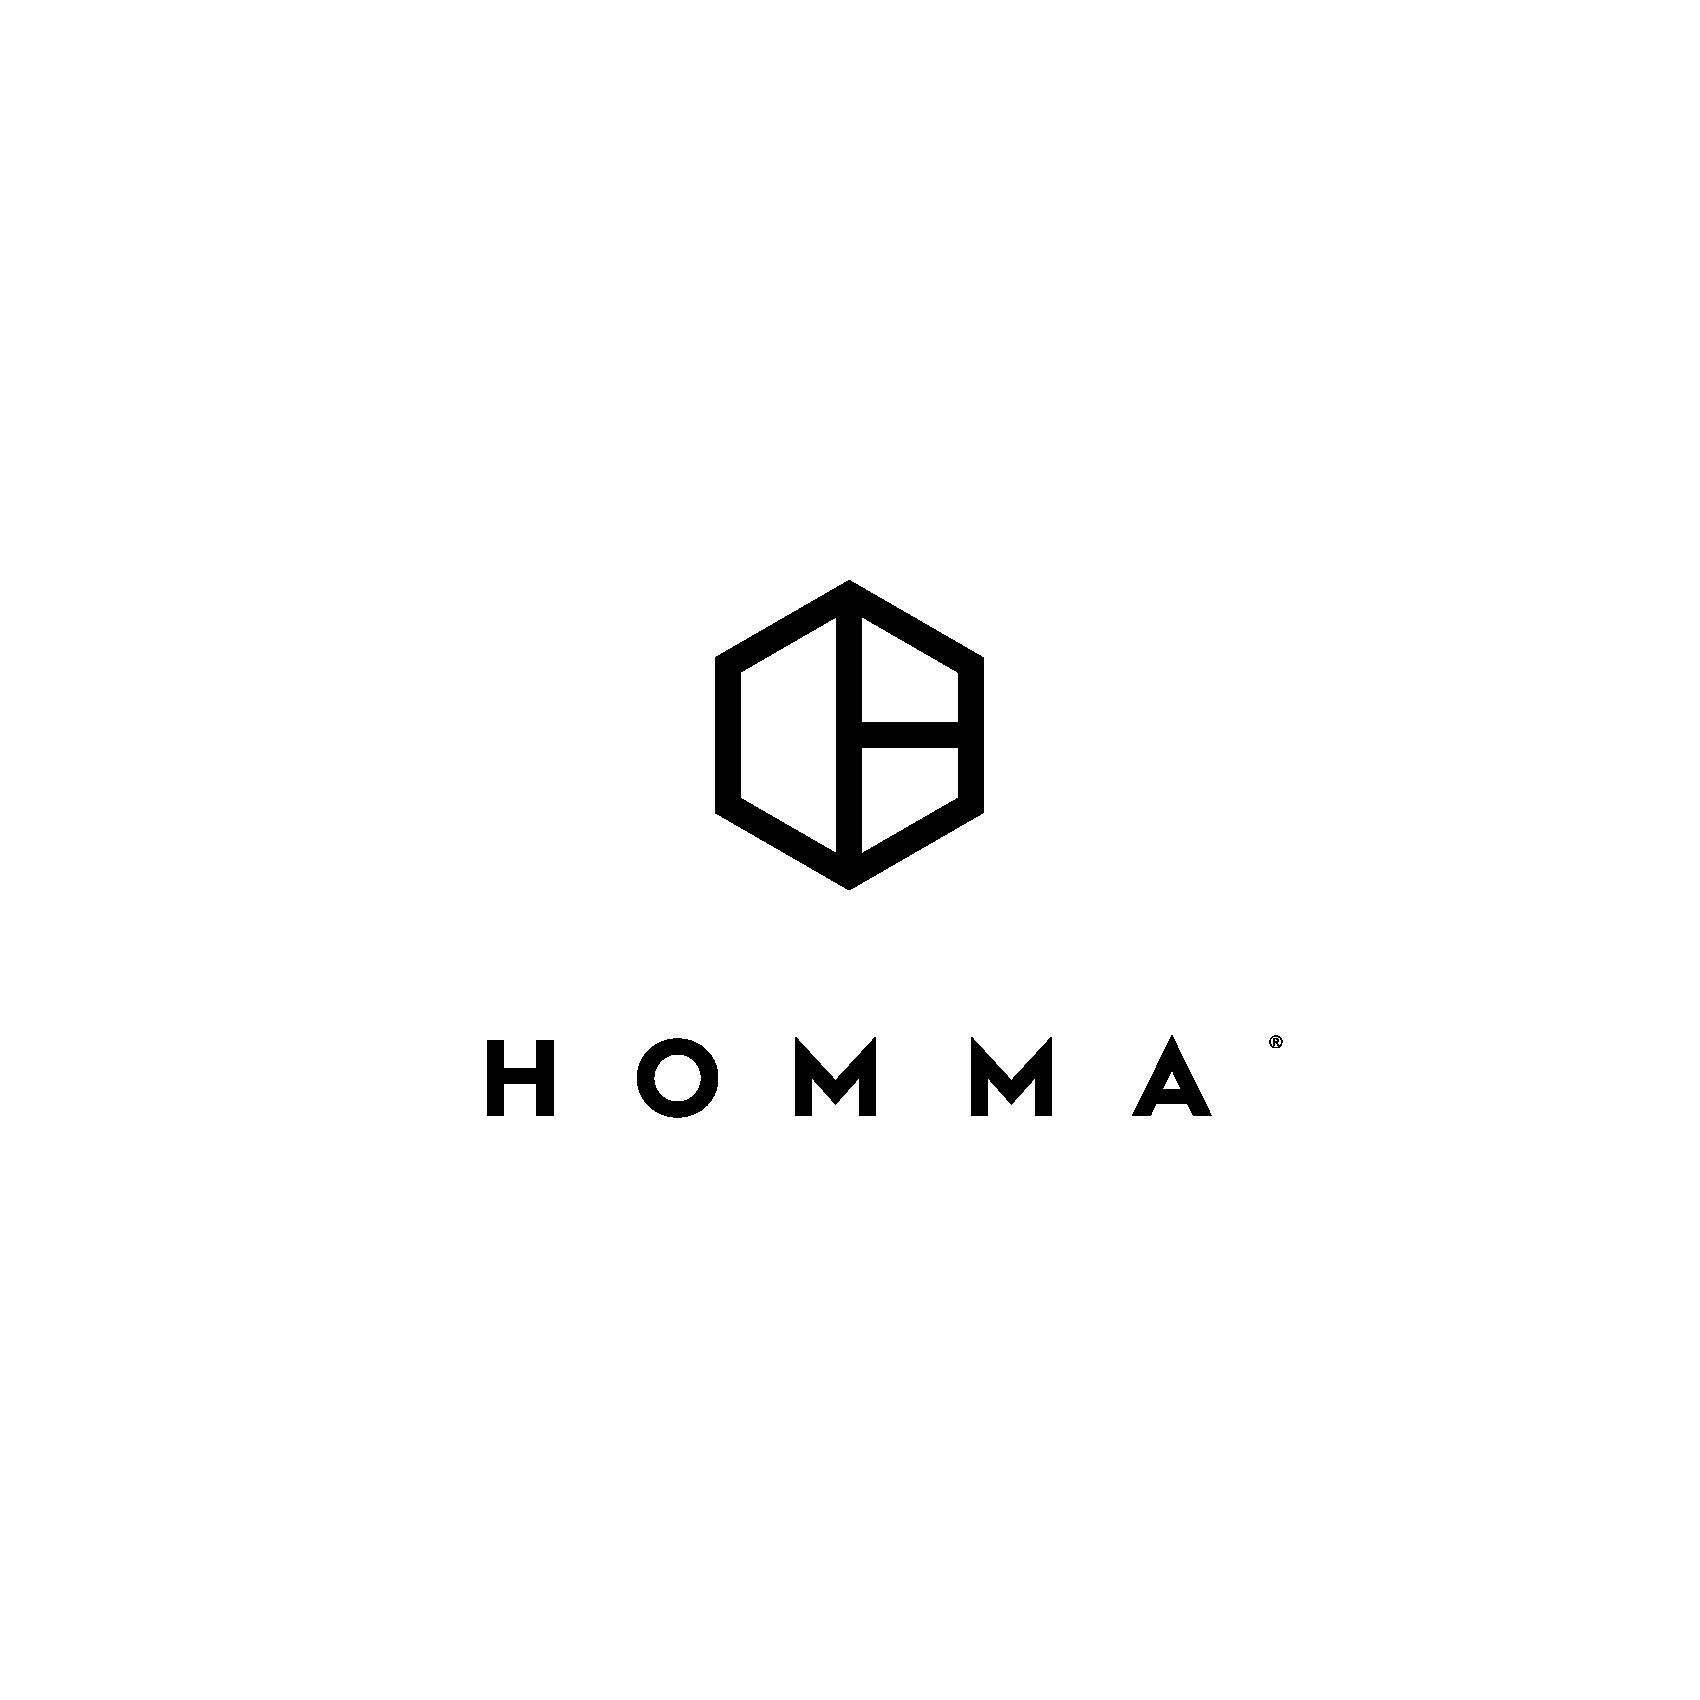 HOMMA, Inc.